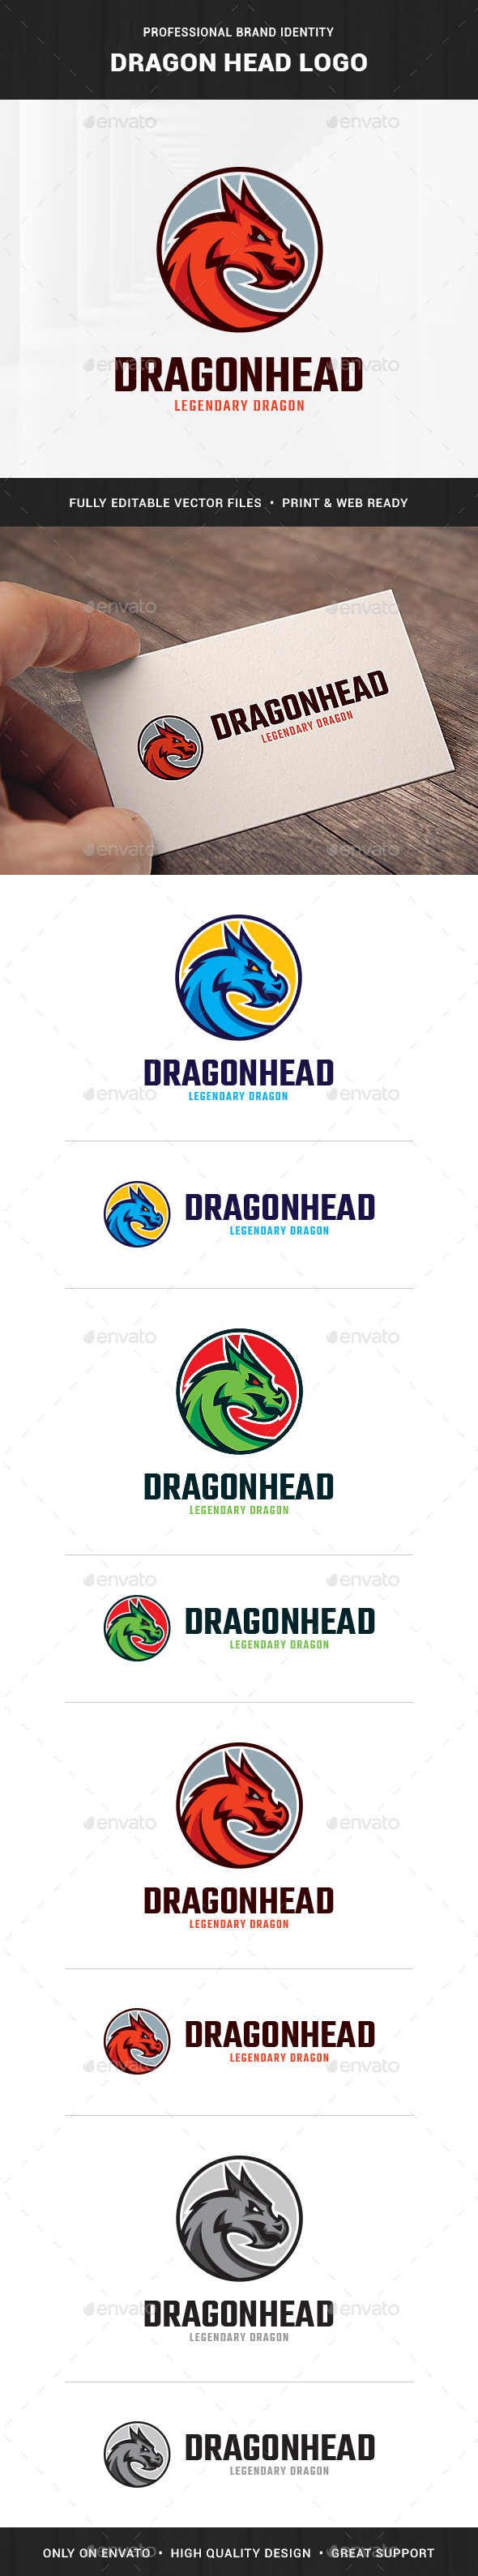 Dragon Head Logo Template